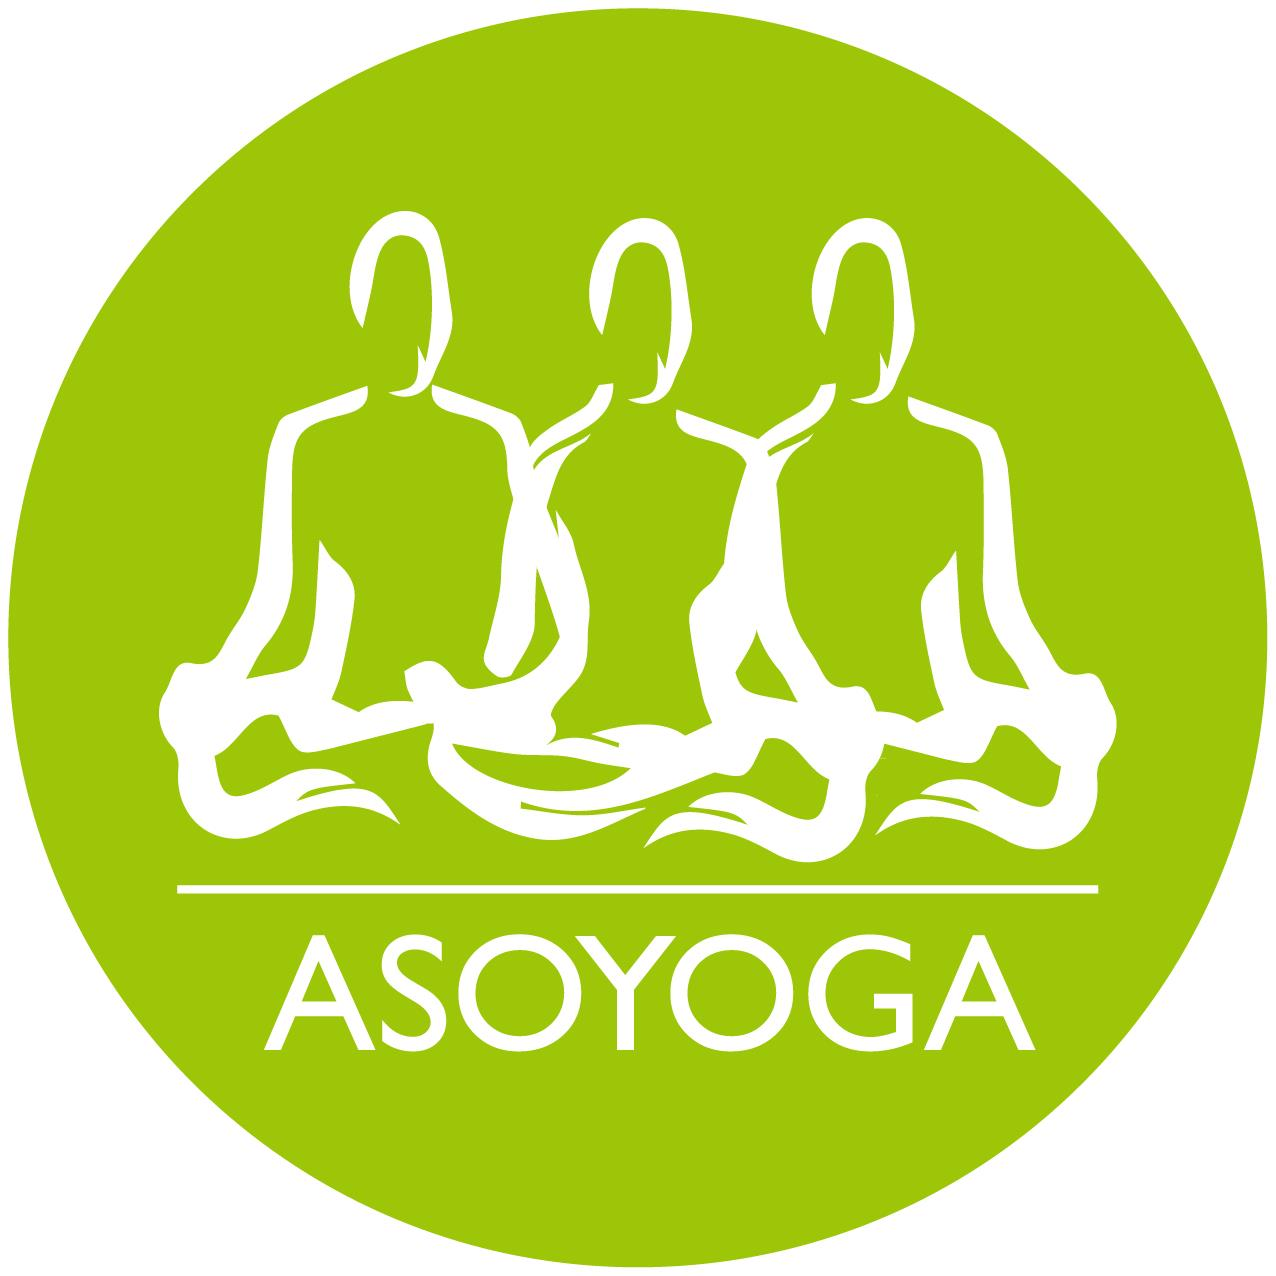 asoyoga